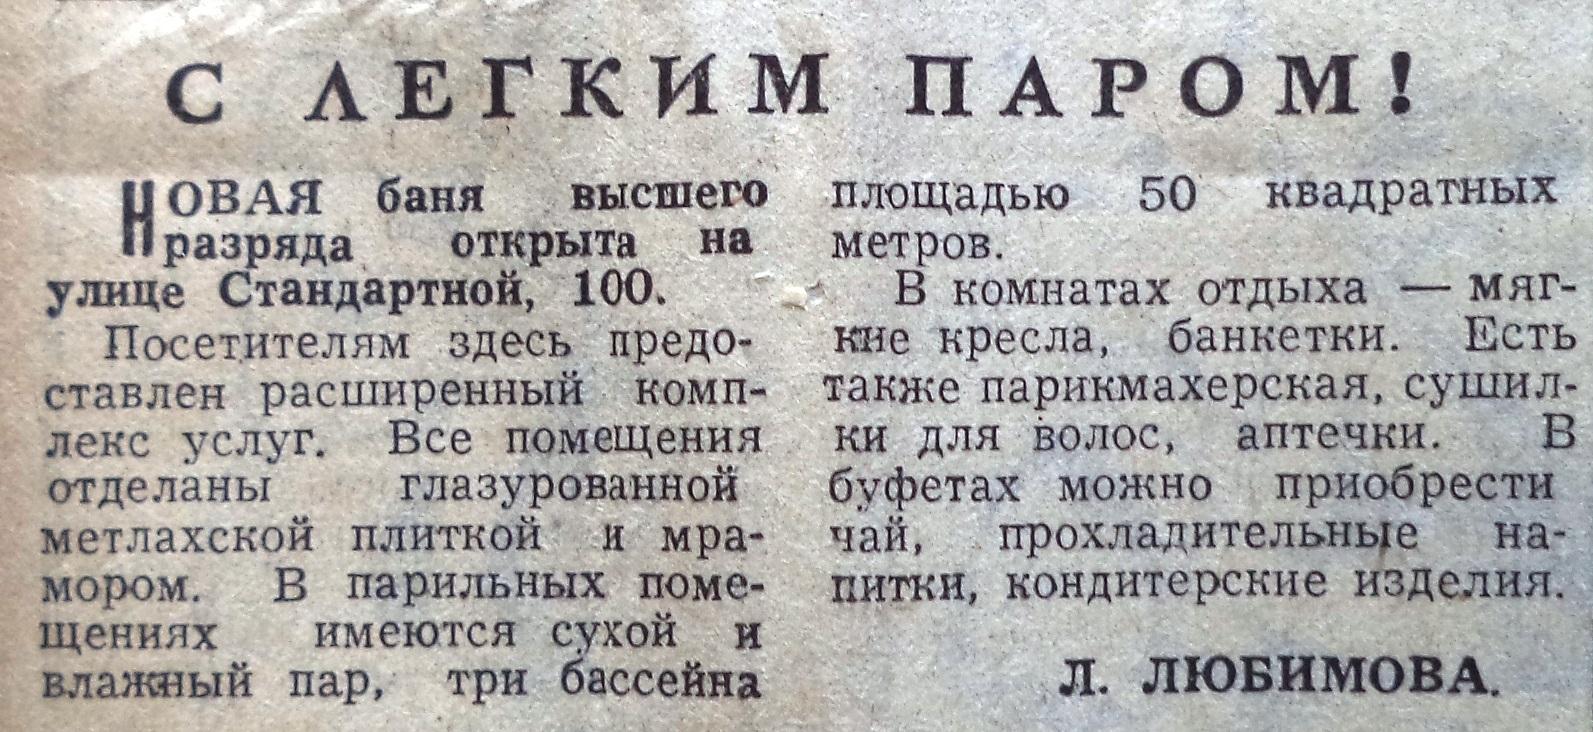 Стандартная-ФОТО-07-ВЗя-1983-04-01-новая баня на Станд.-100